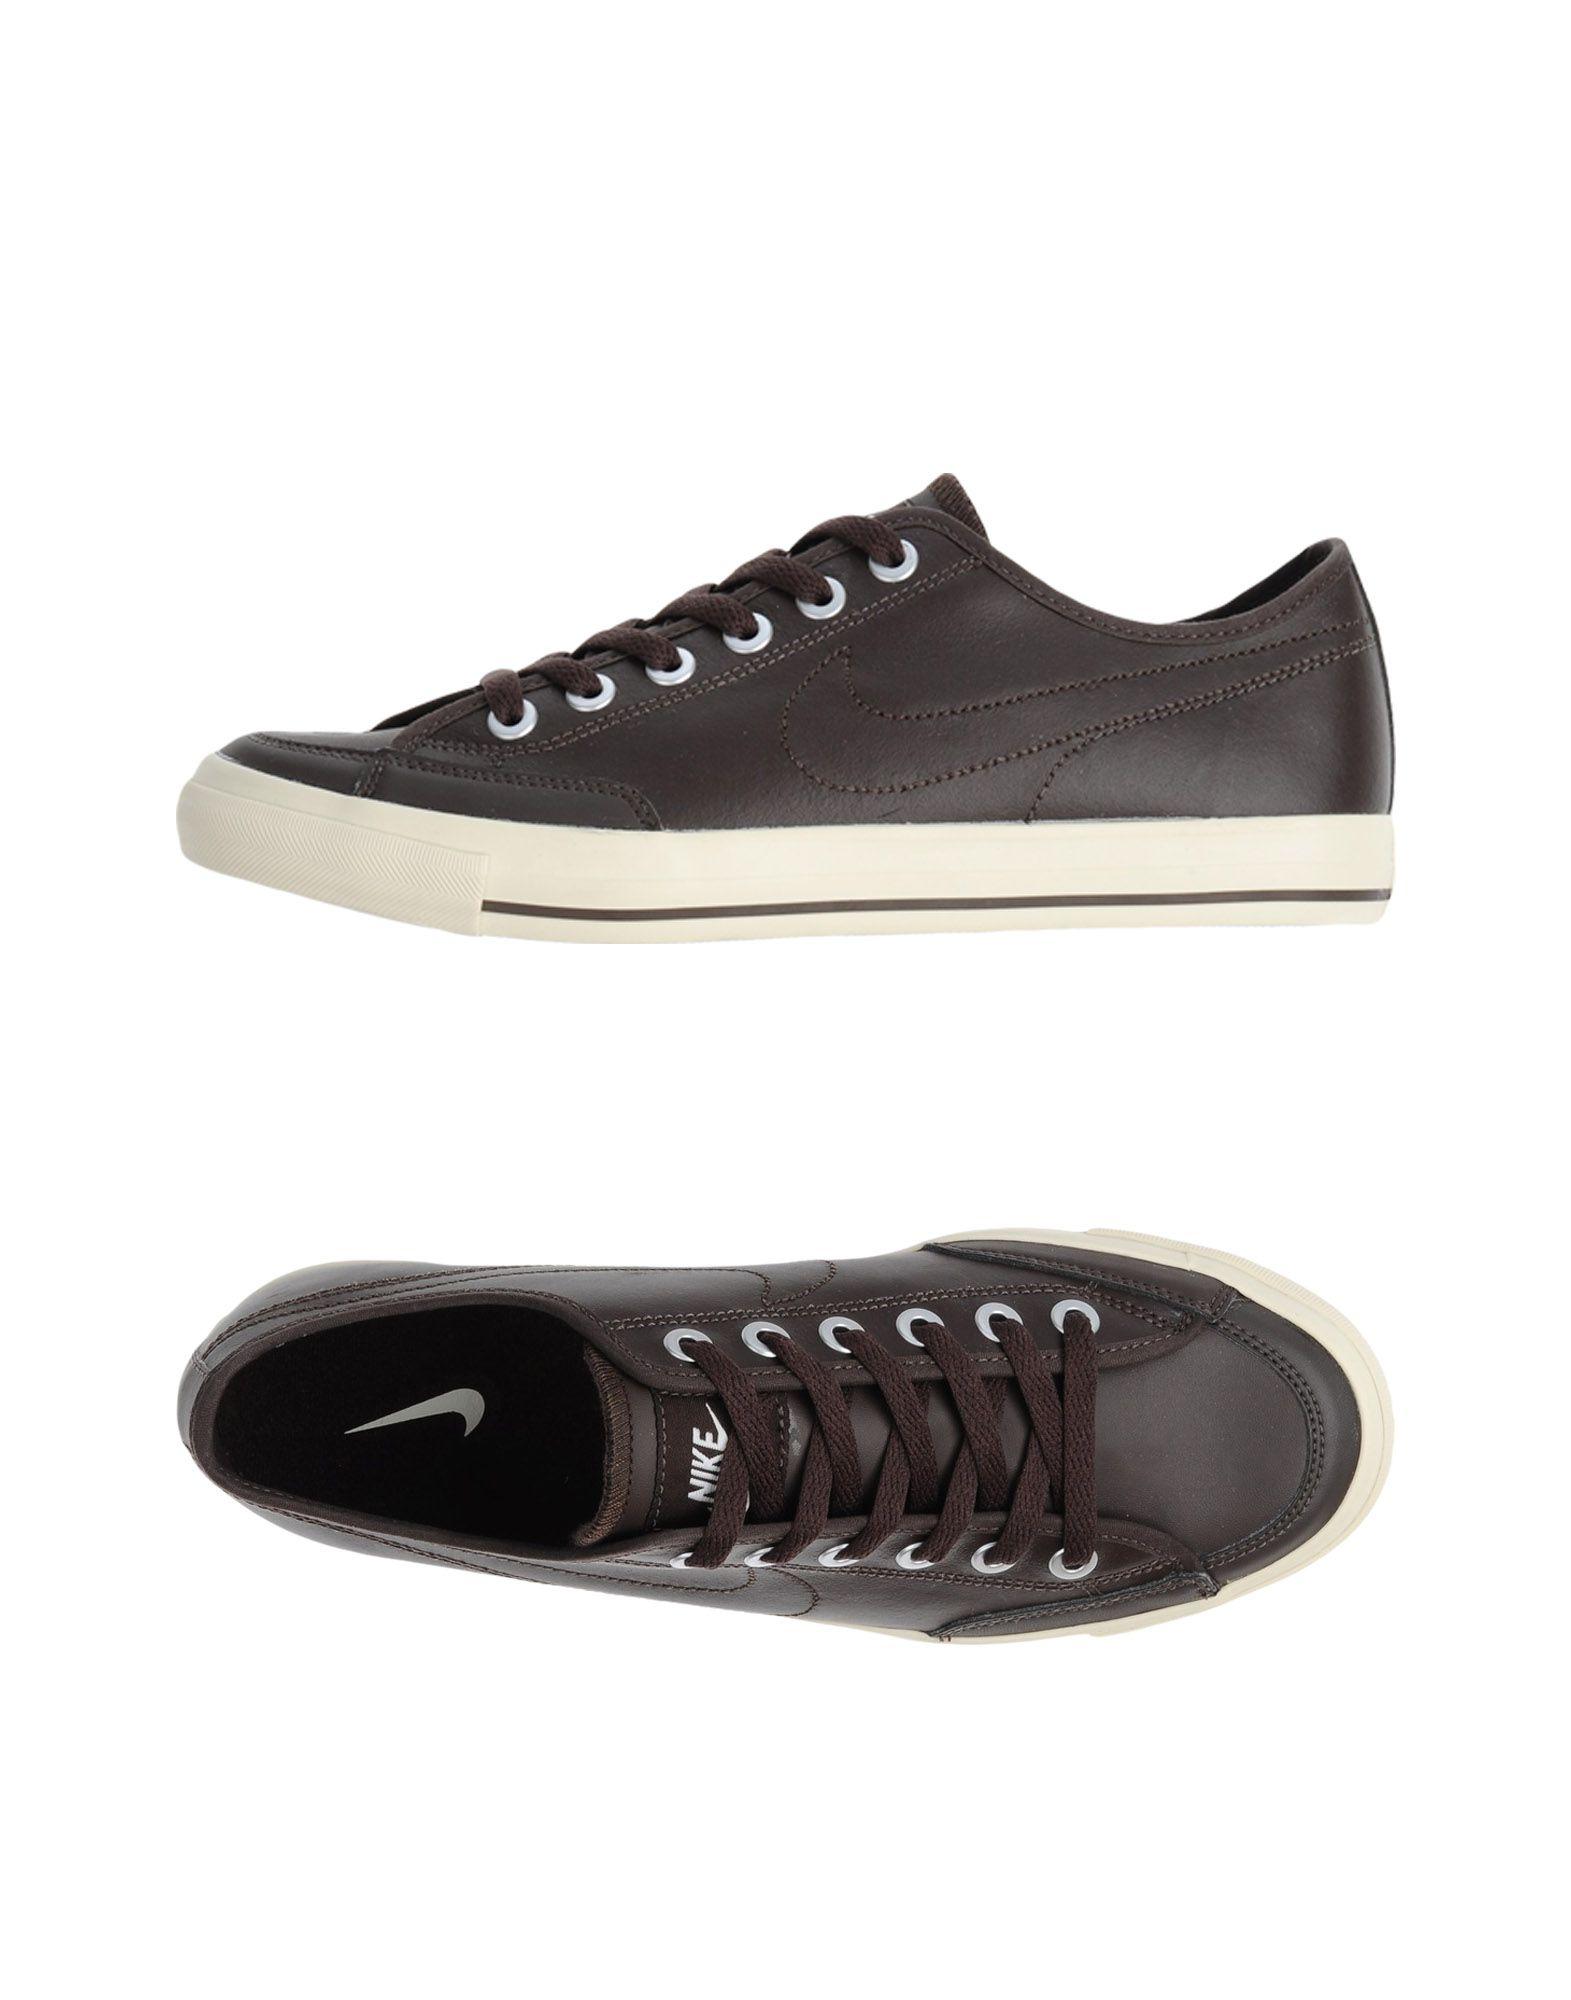 Nike Sneakers Herren Heiße  11350641VF Heiße Herren Schuhe 685a39